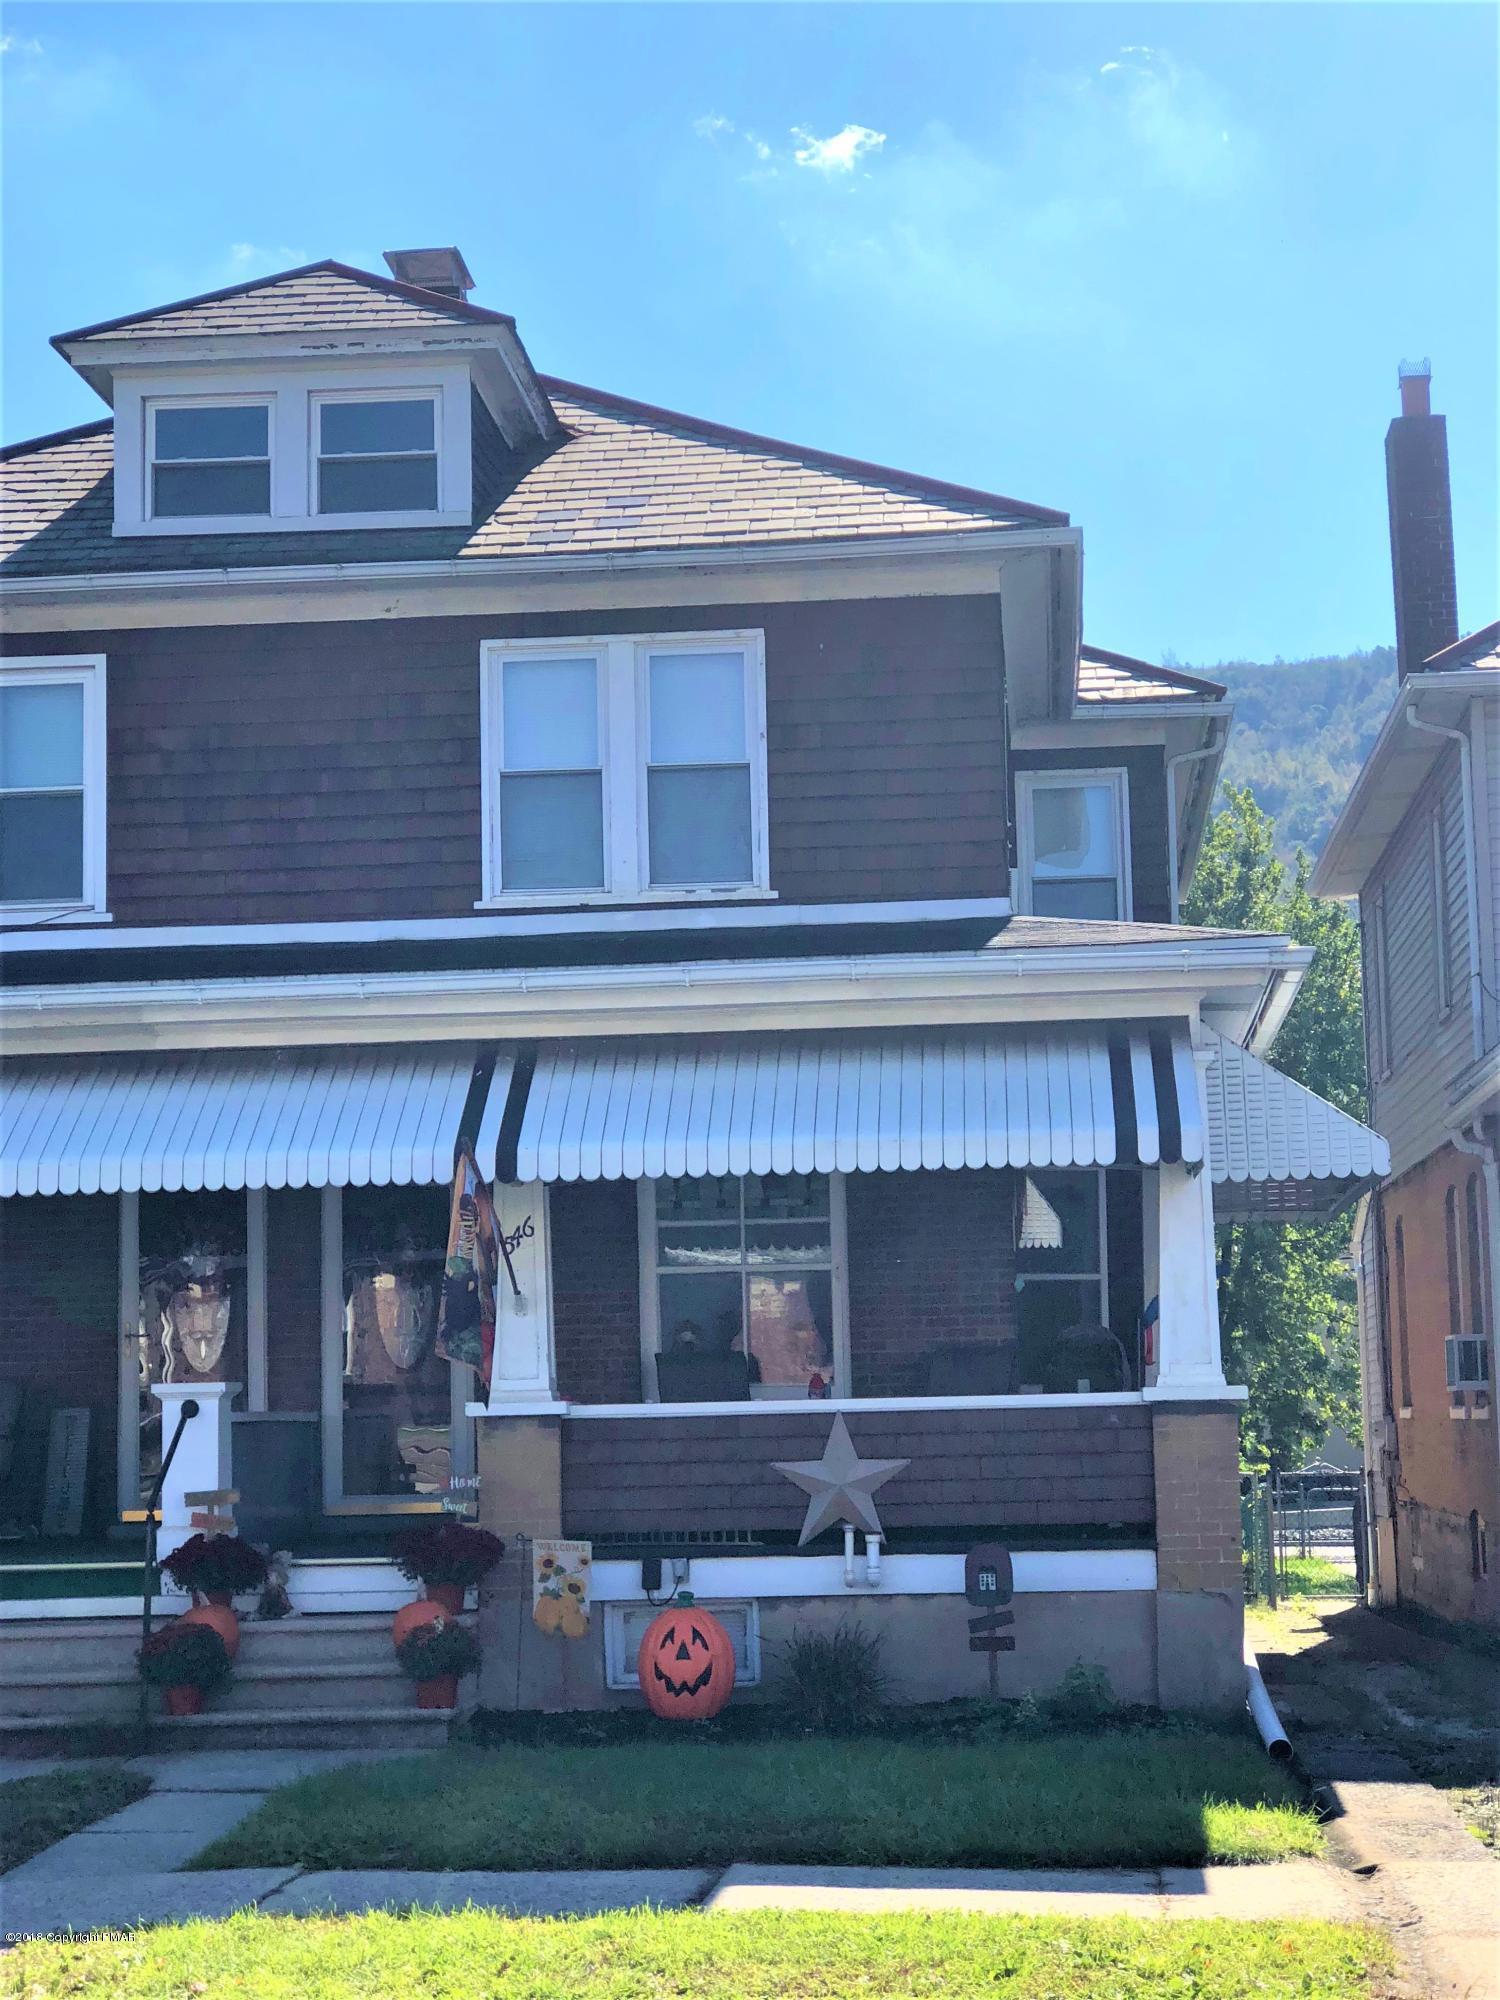 546 Franklin Ave, Palmerton, PA 18071